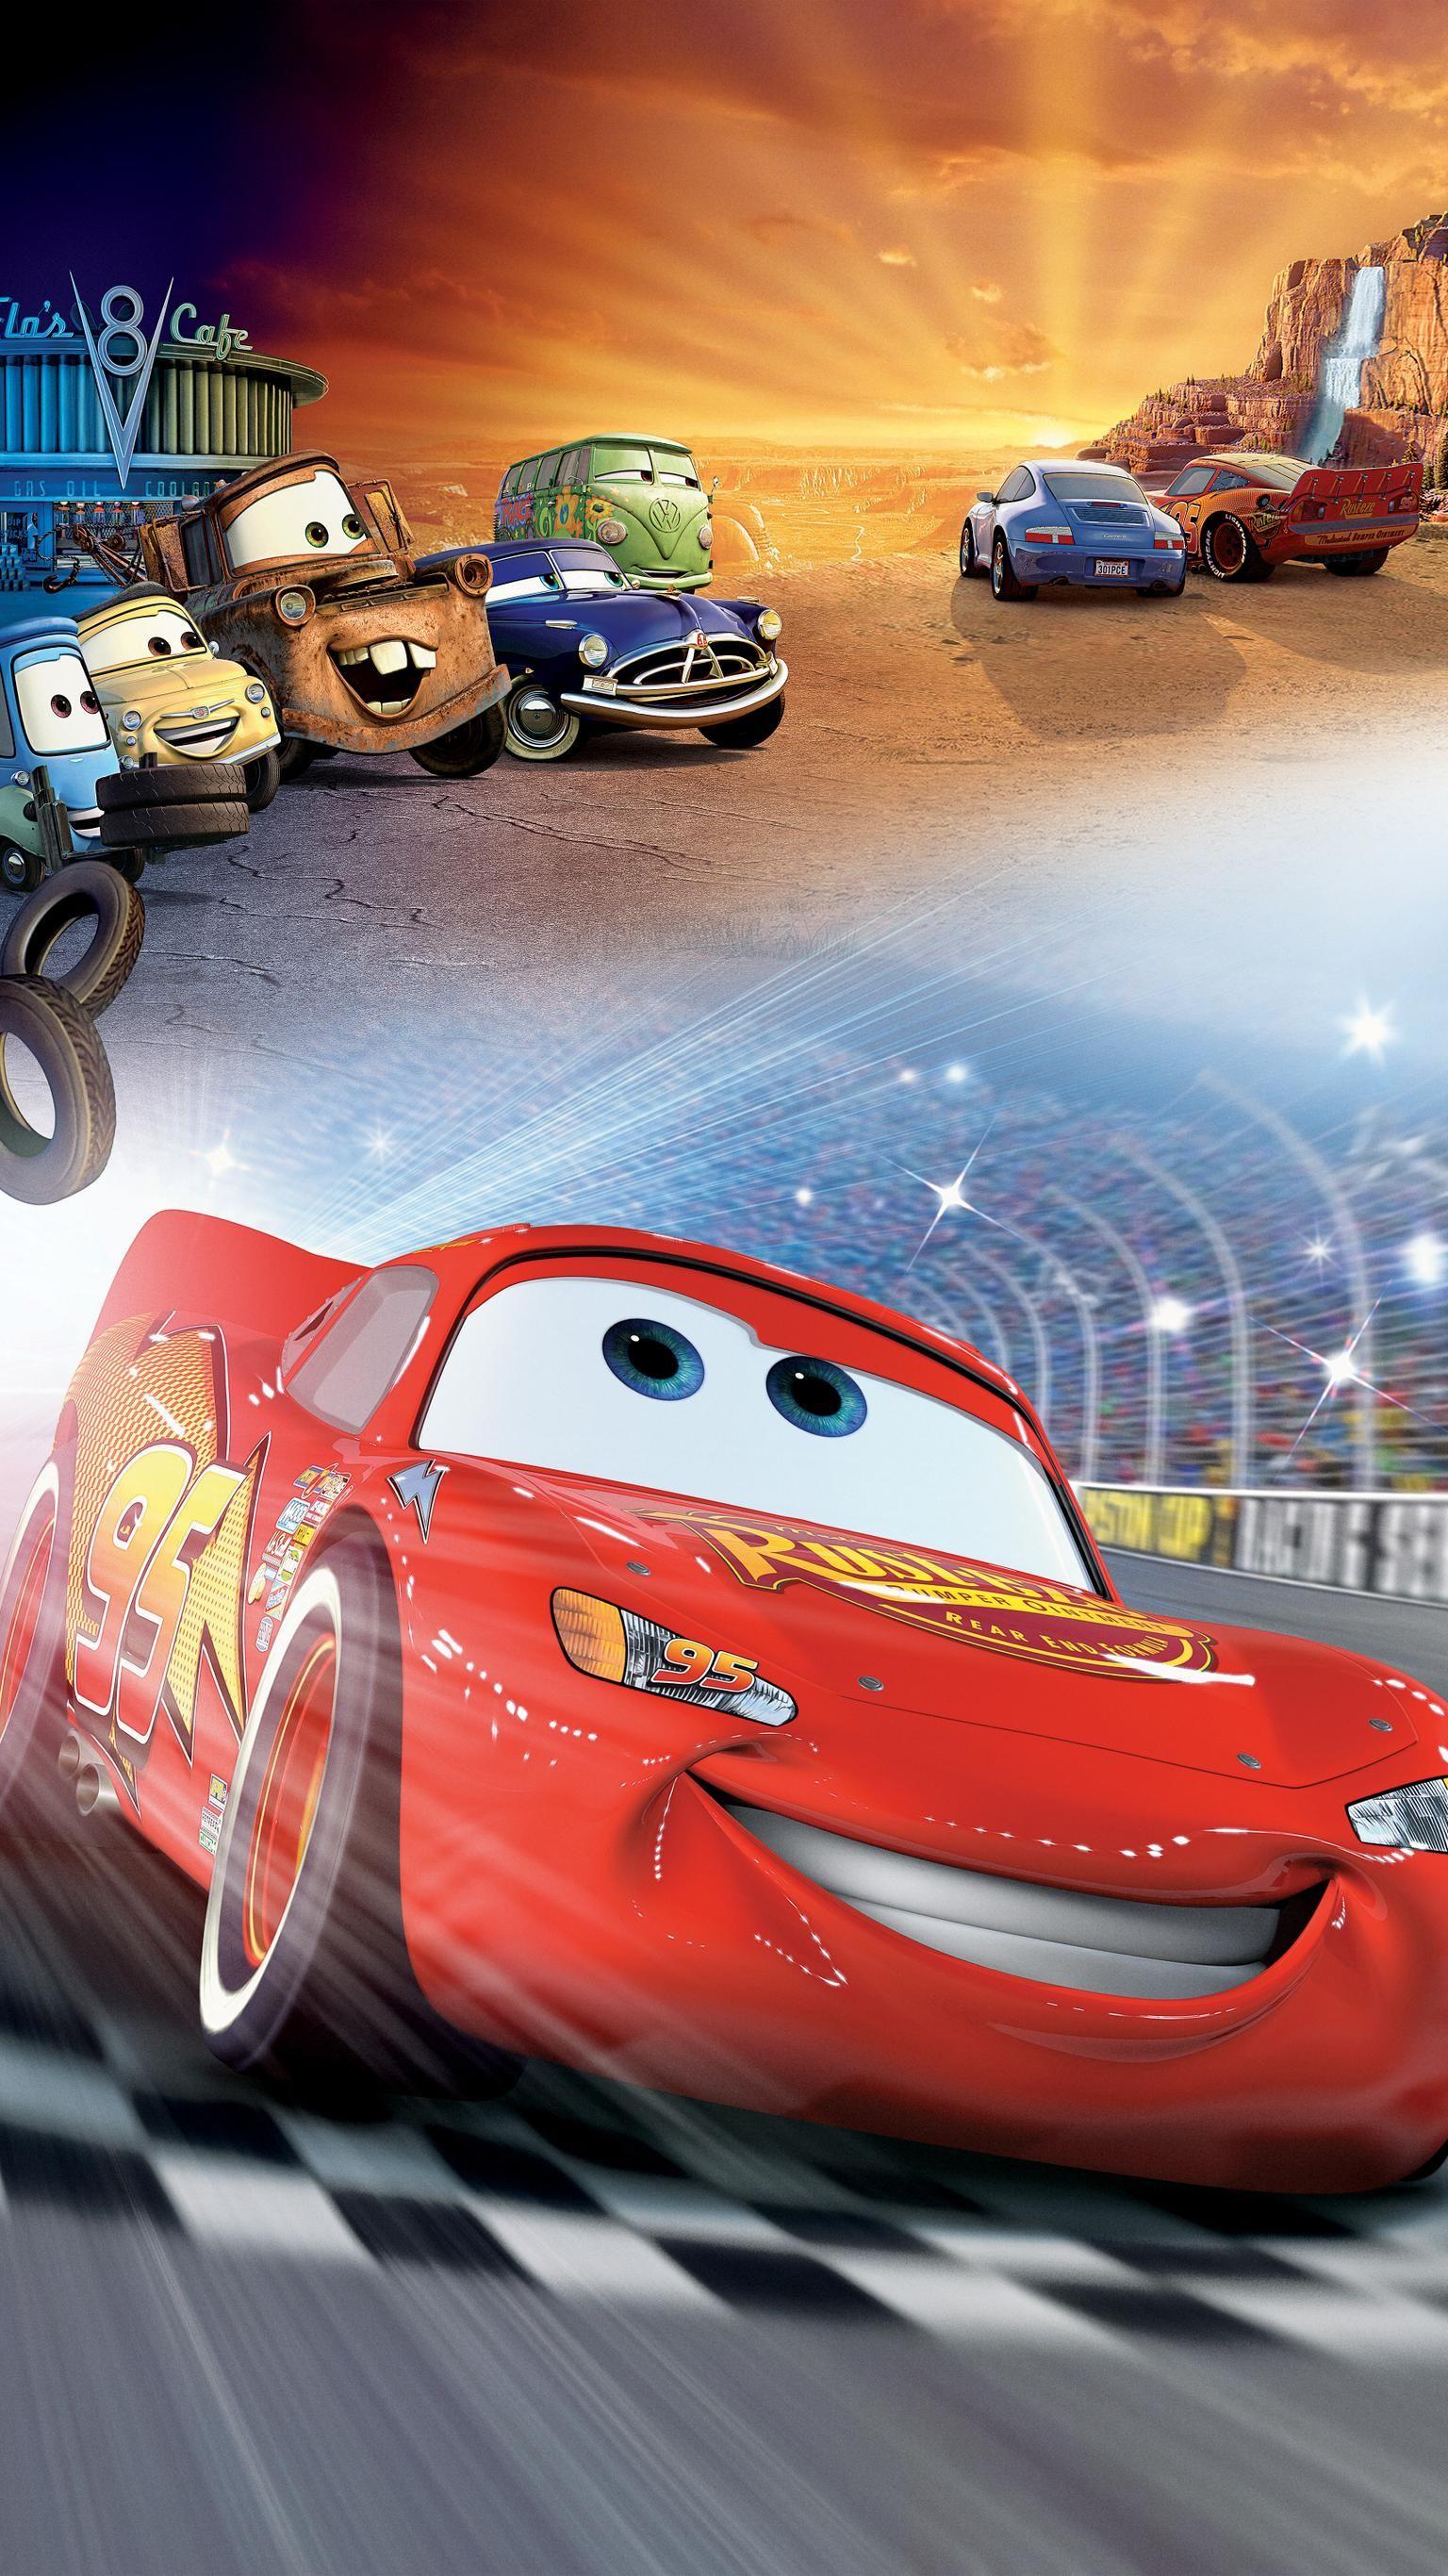 Cars 2006 Phone Wallpaper Moviemania Disney Cars Wallpaper Cars Movie Disney Pixar Cars